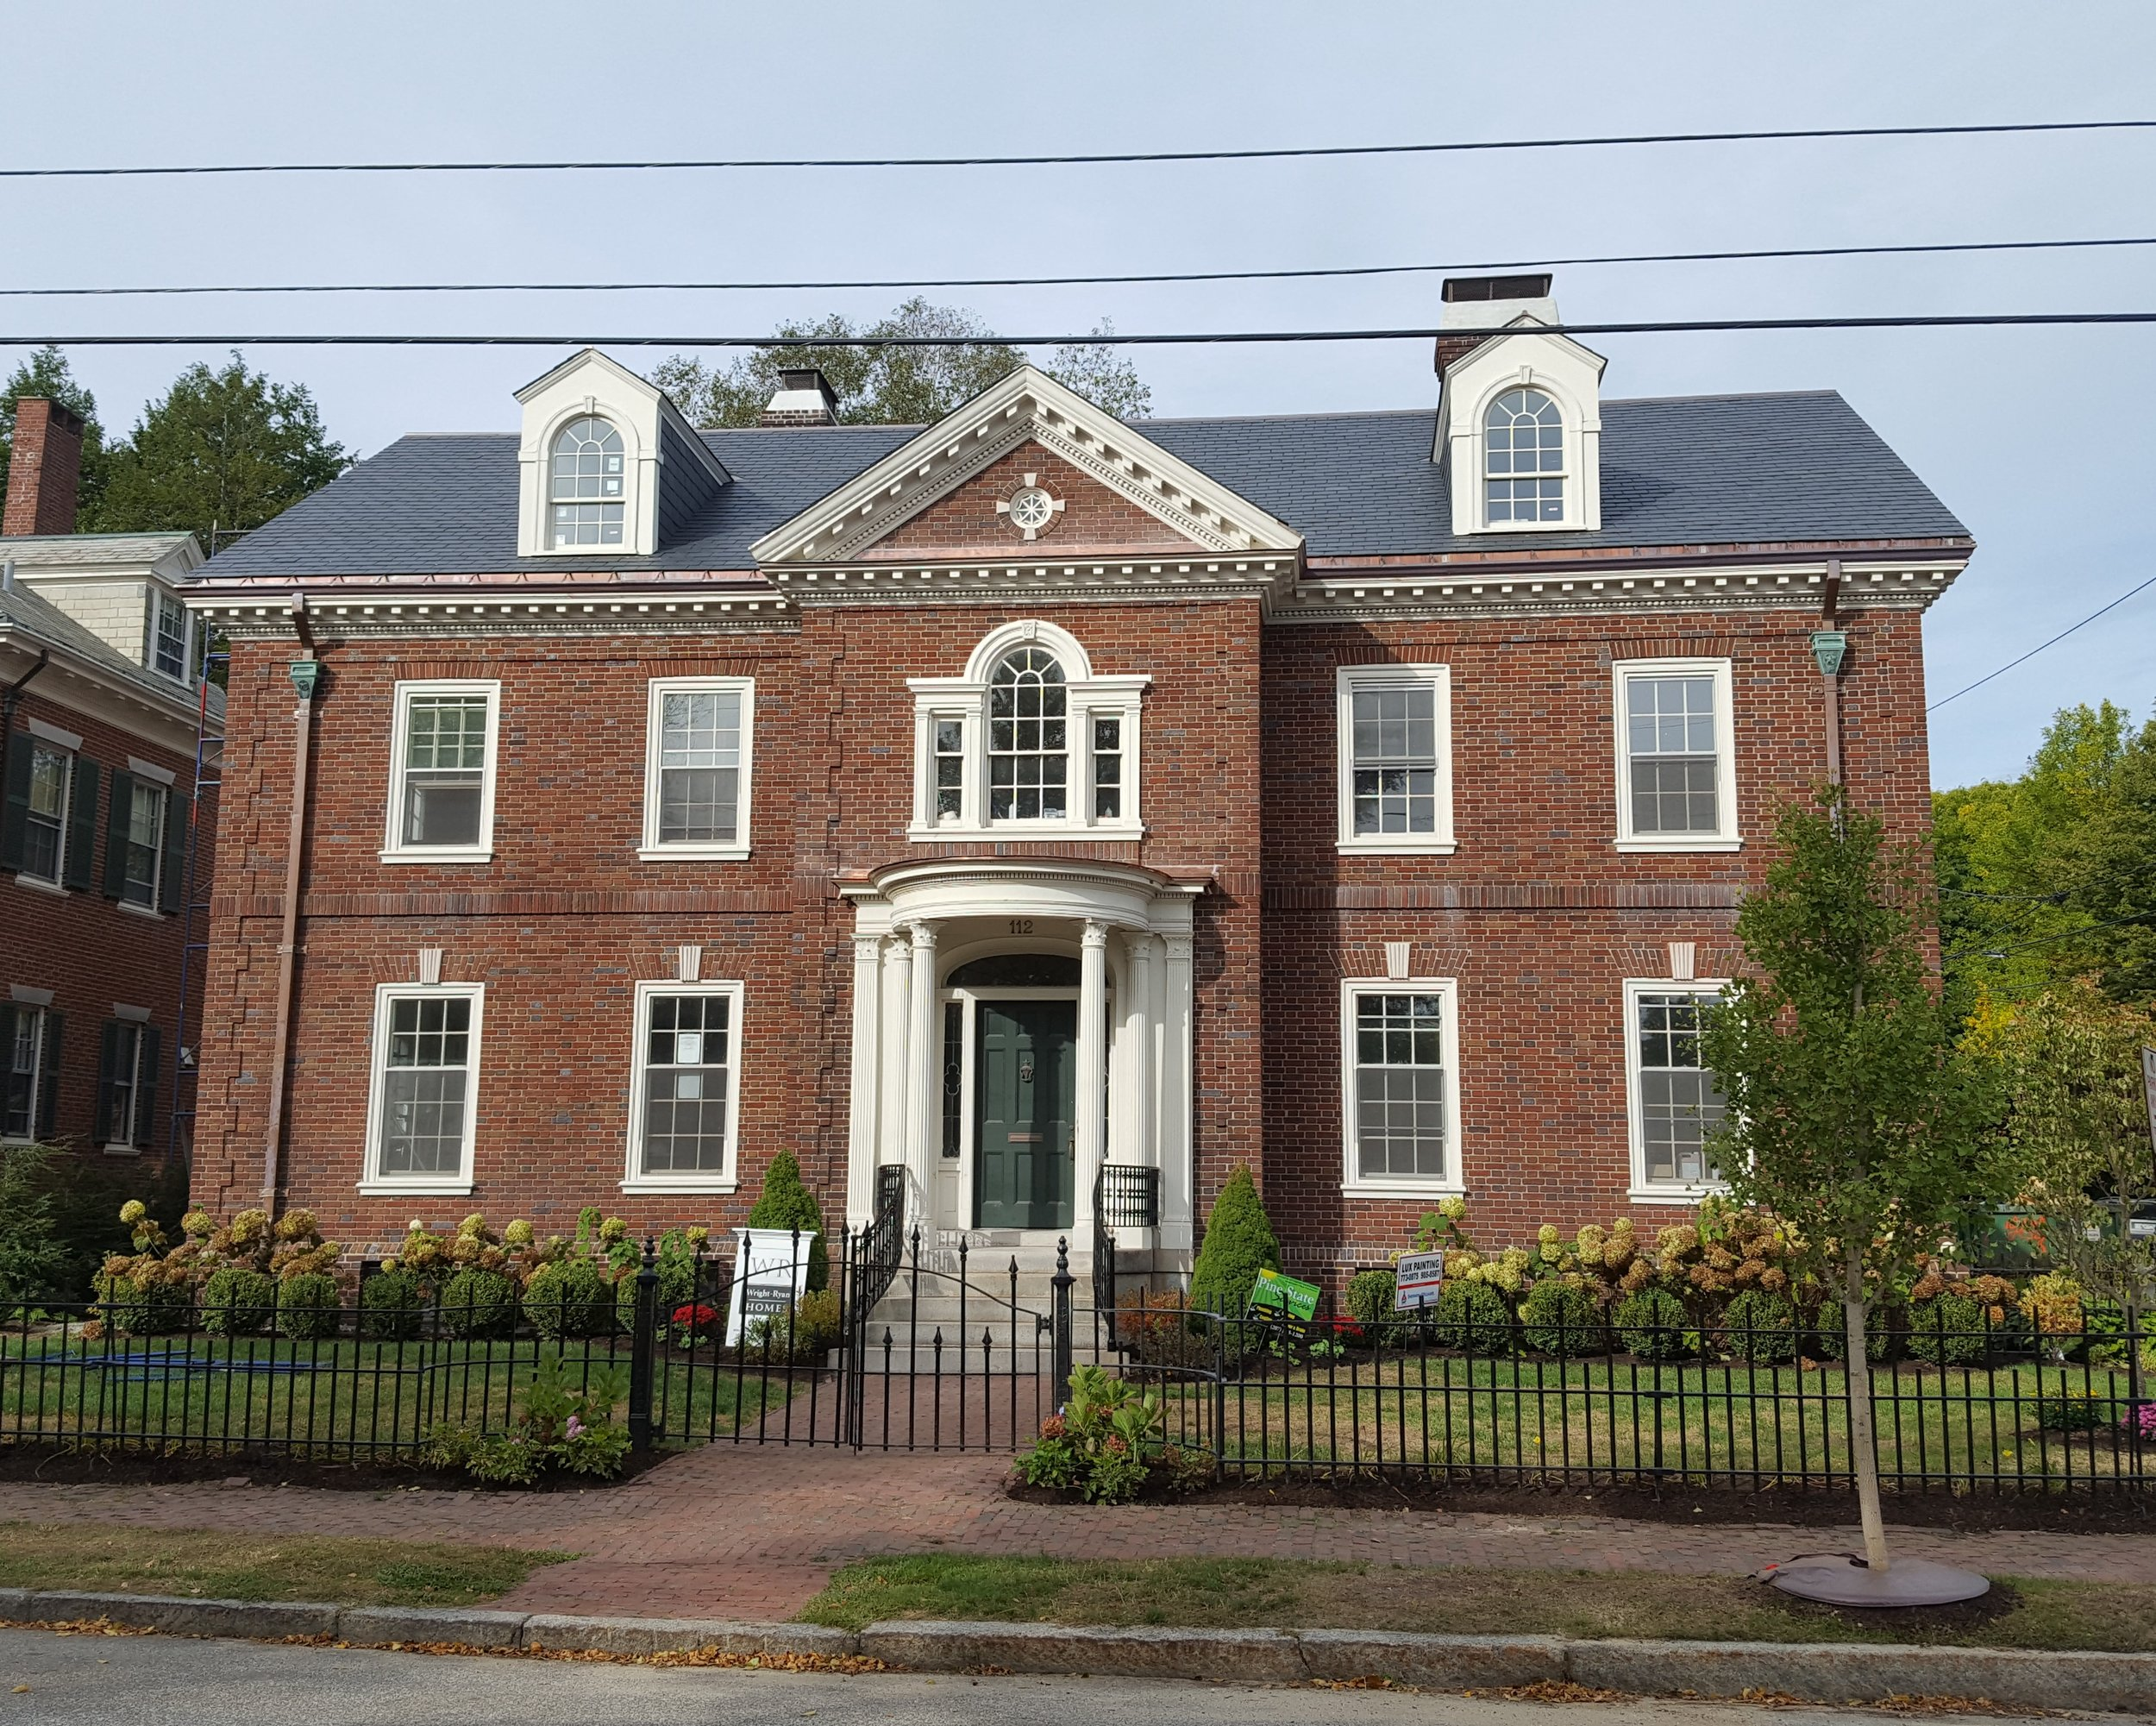 Wright-Ryan Homes West End Photo.jpg